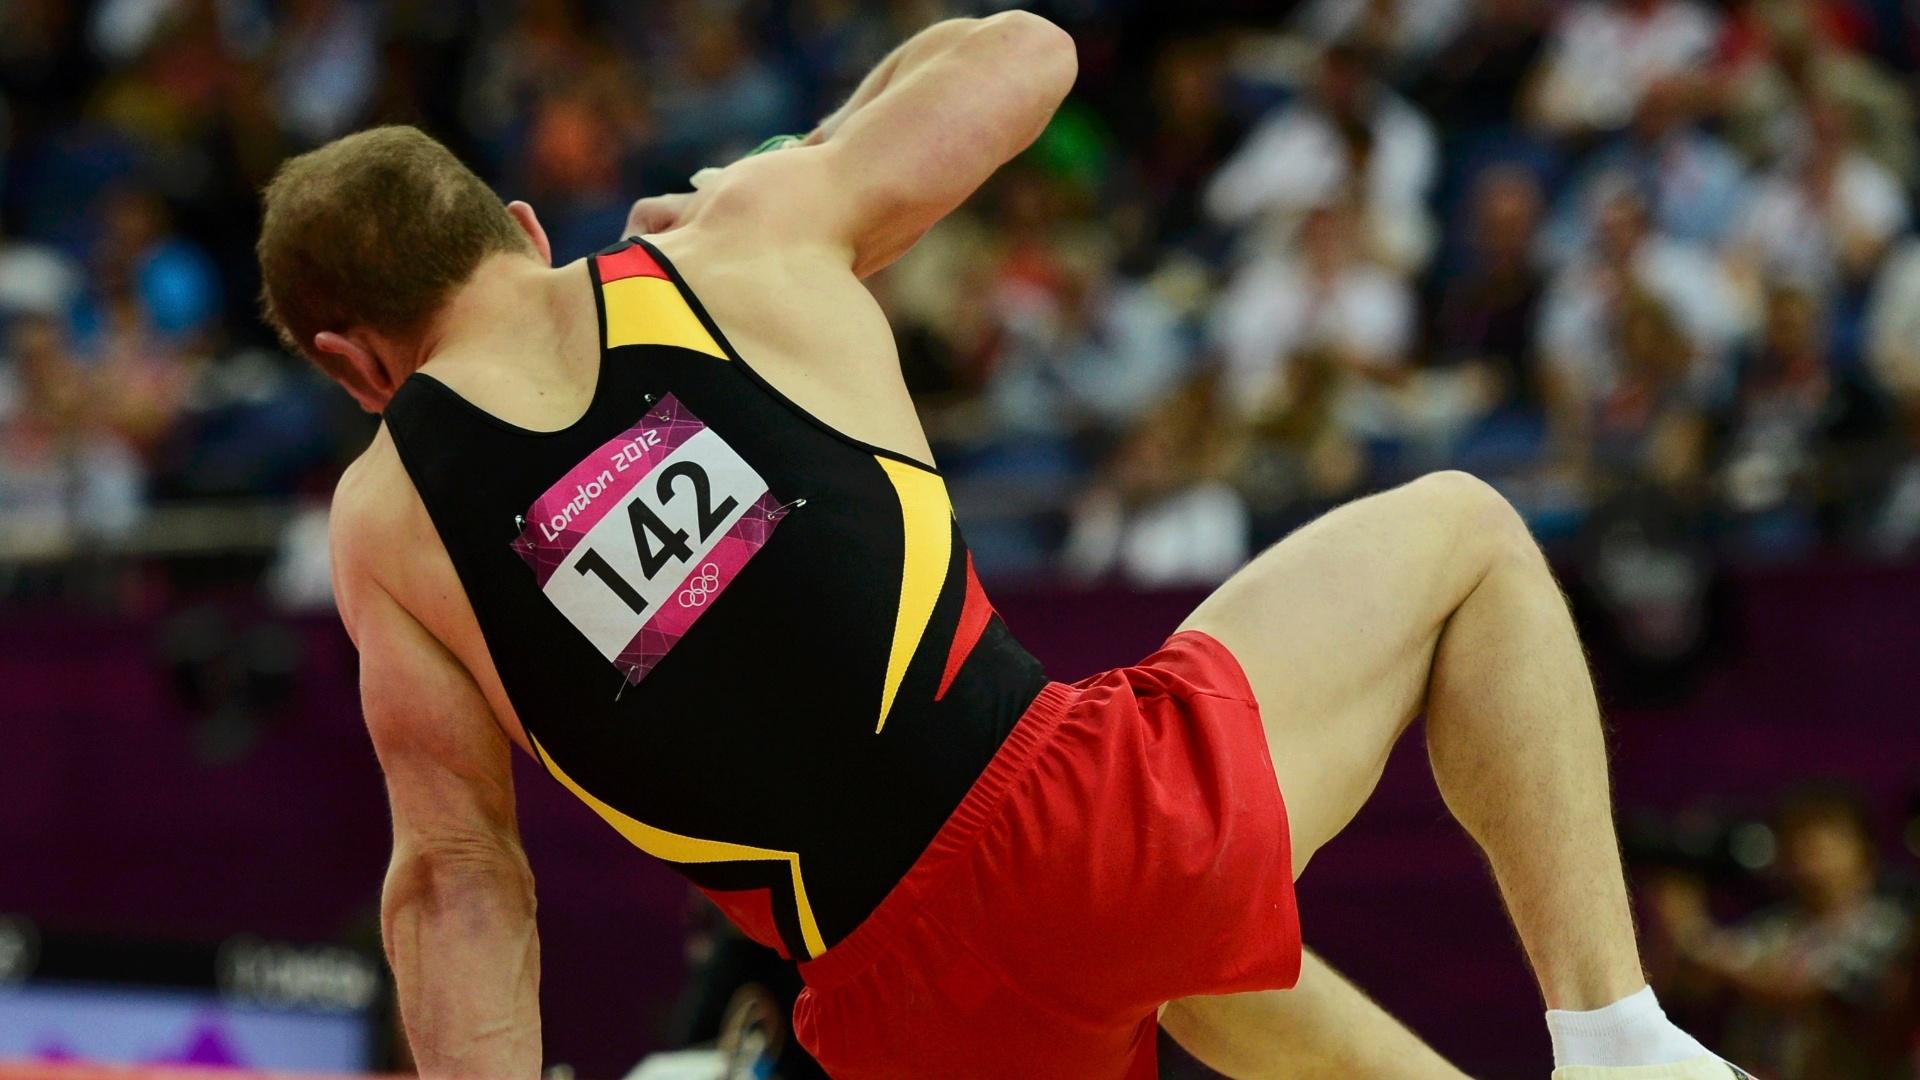 Alemão Fabian Hambuchen tenta se levantar após cair na aterrissagem de seu salto na final desta quarta-feira